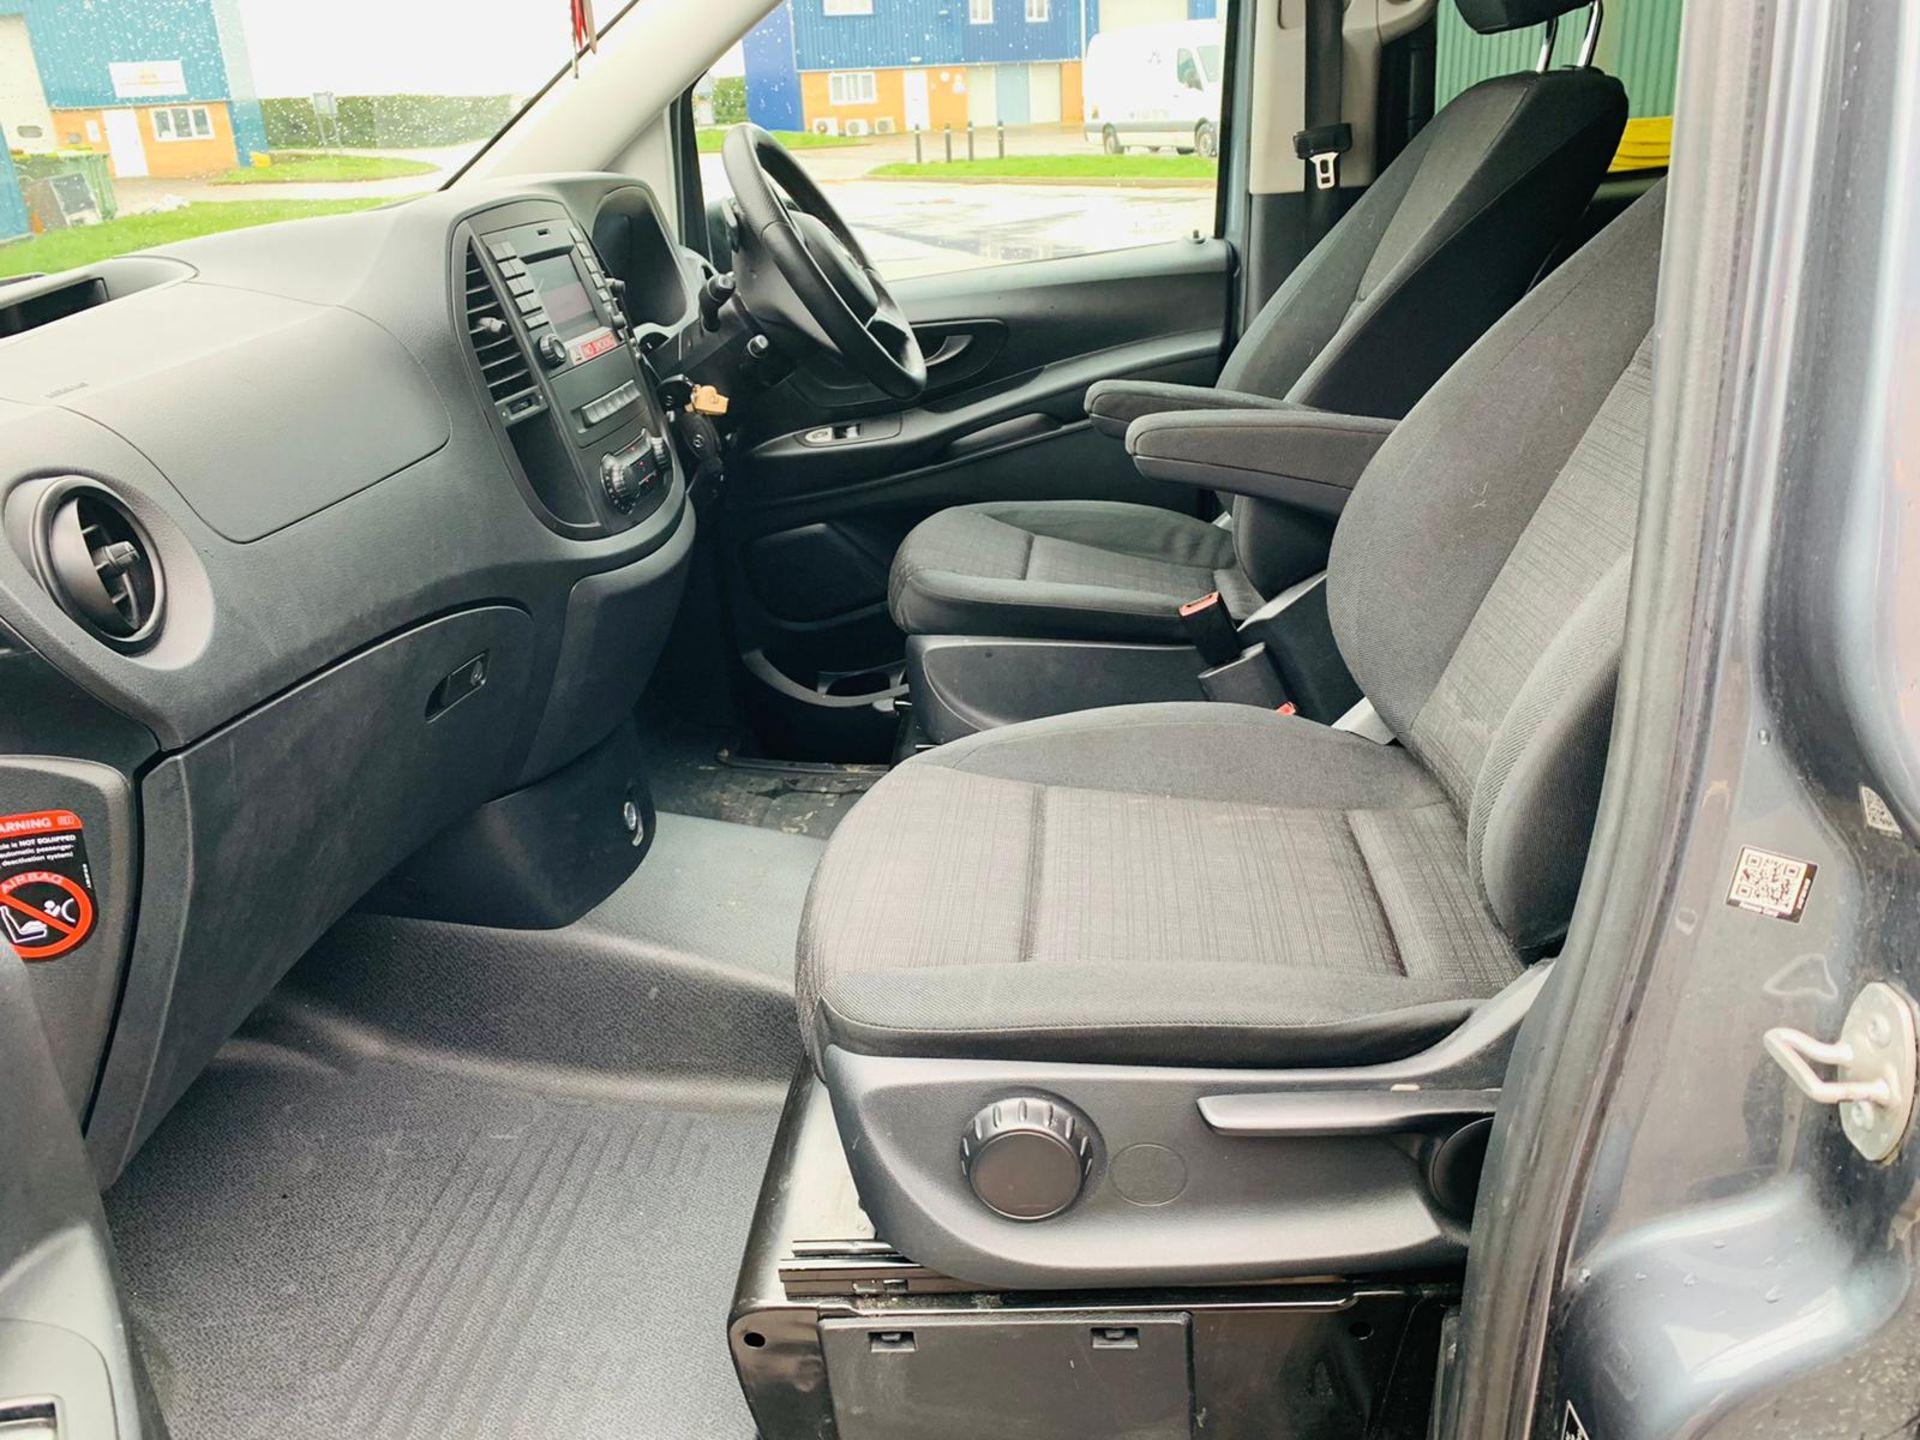 Mercedes Vito 114 Bluetec Dualiner/Crew Van - Auto - Air Con - 2018 18 Reg - 1 Owner From New - Image 12 of 25